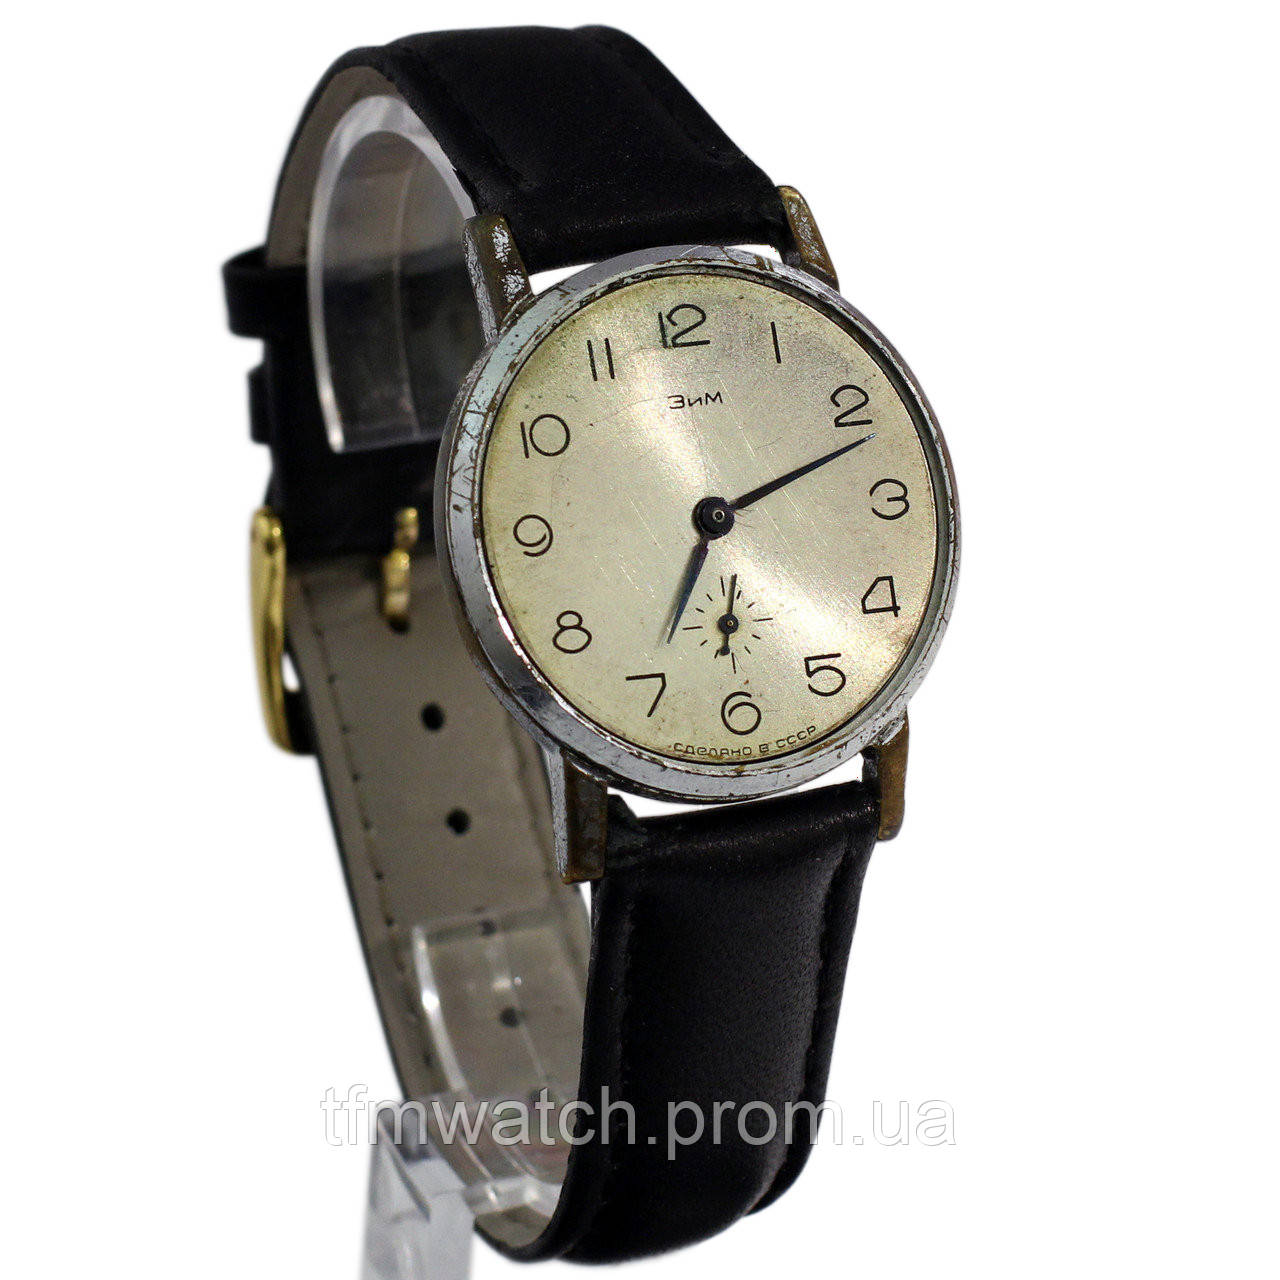 ЗИМ часы наручные СССР, фото 1